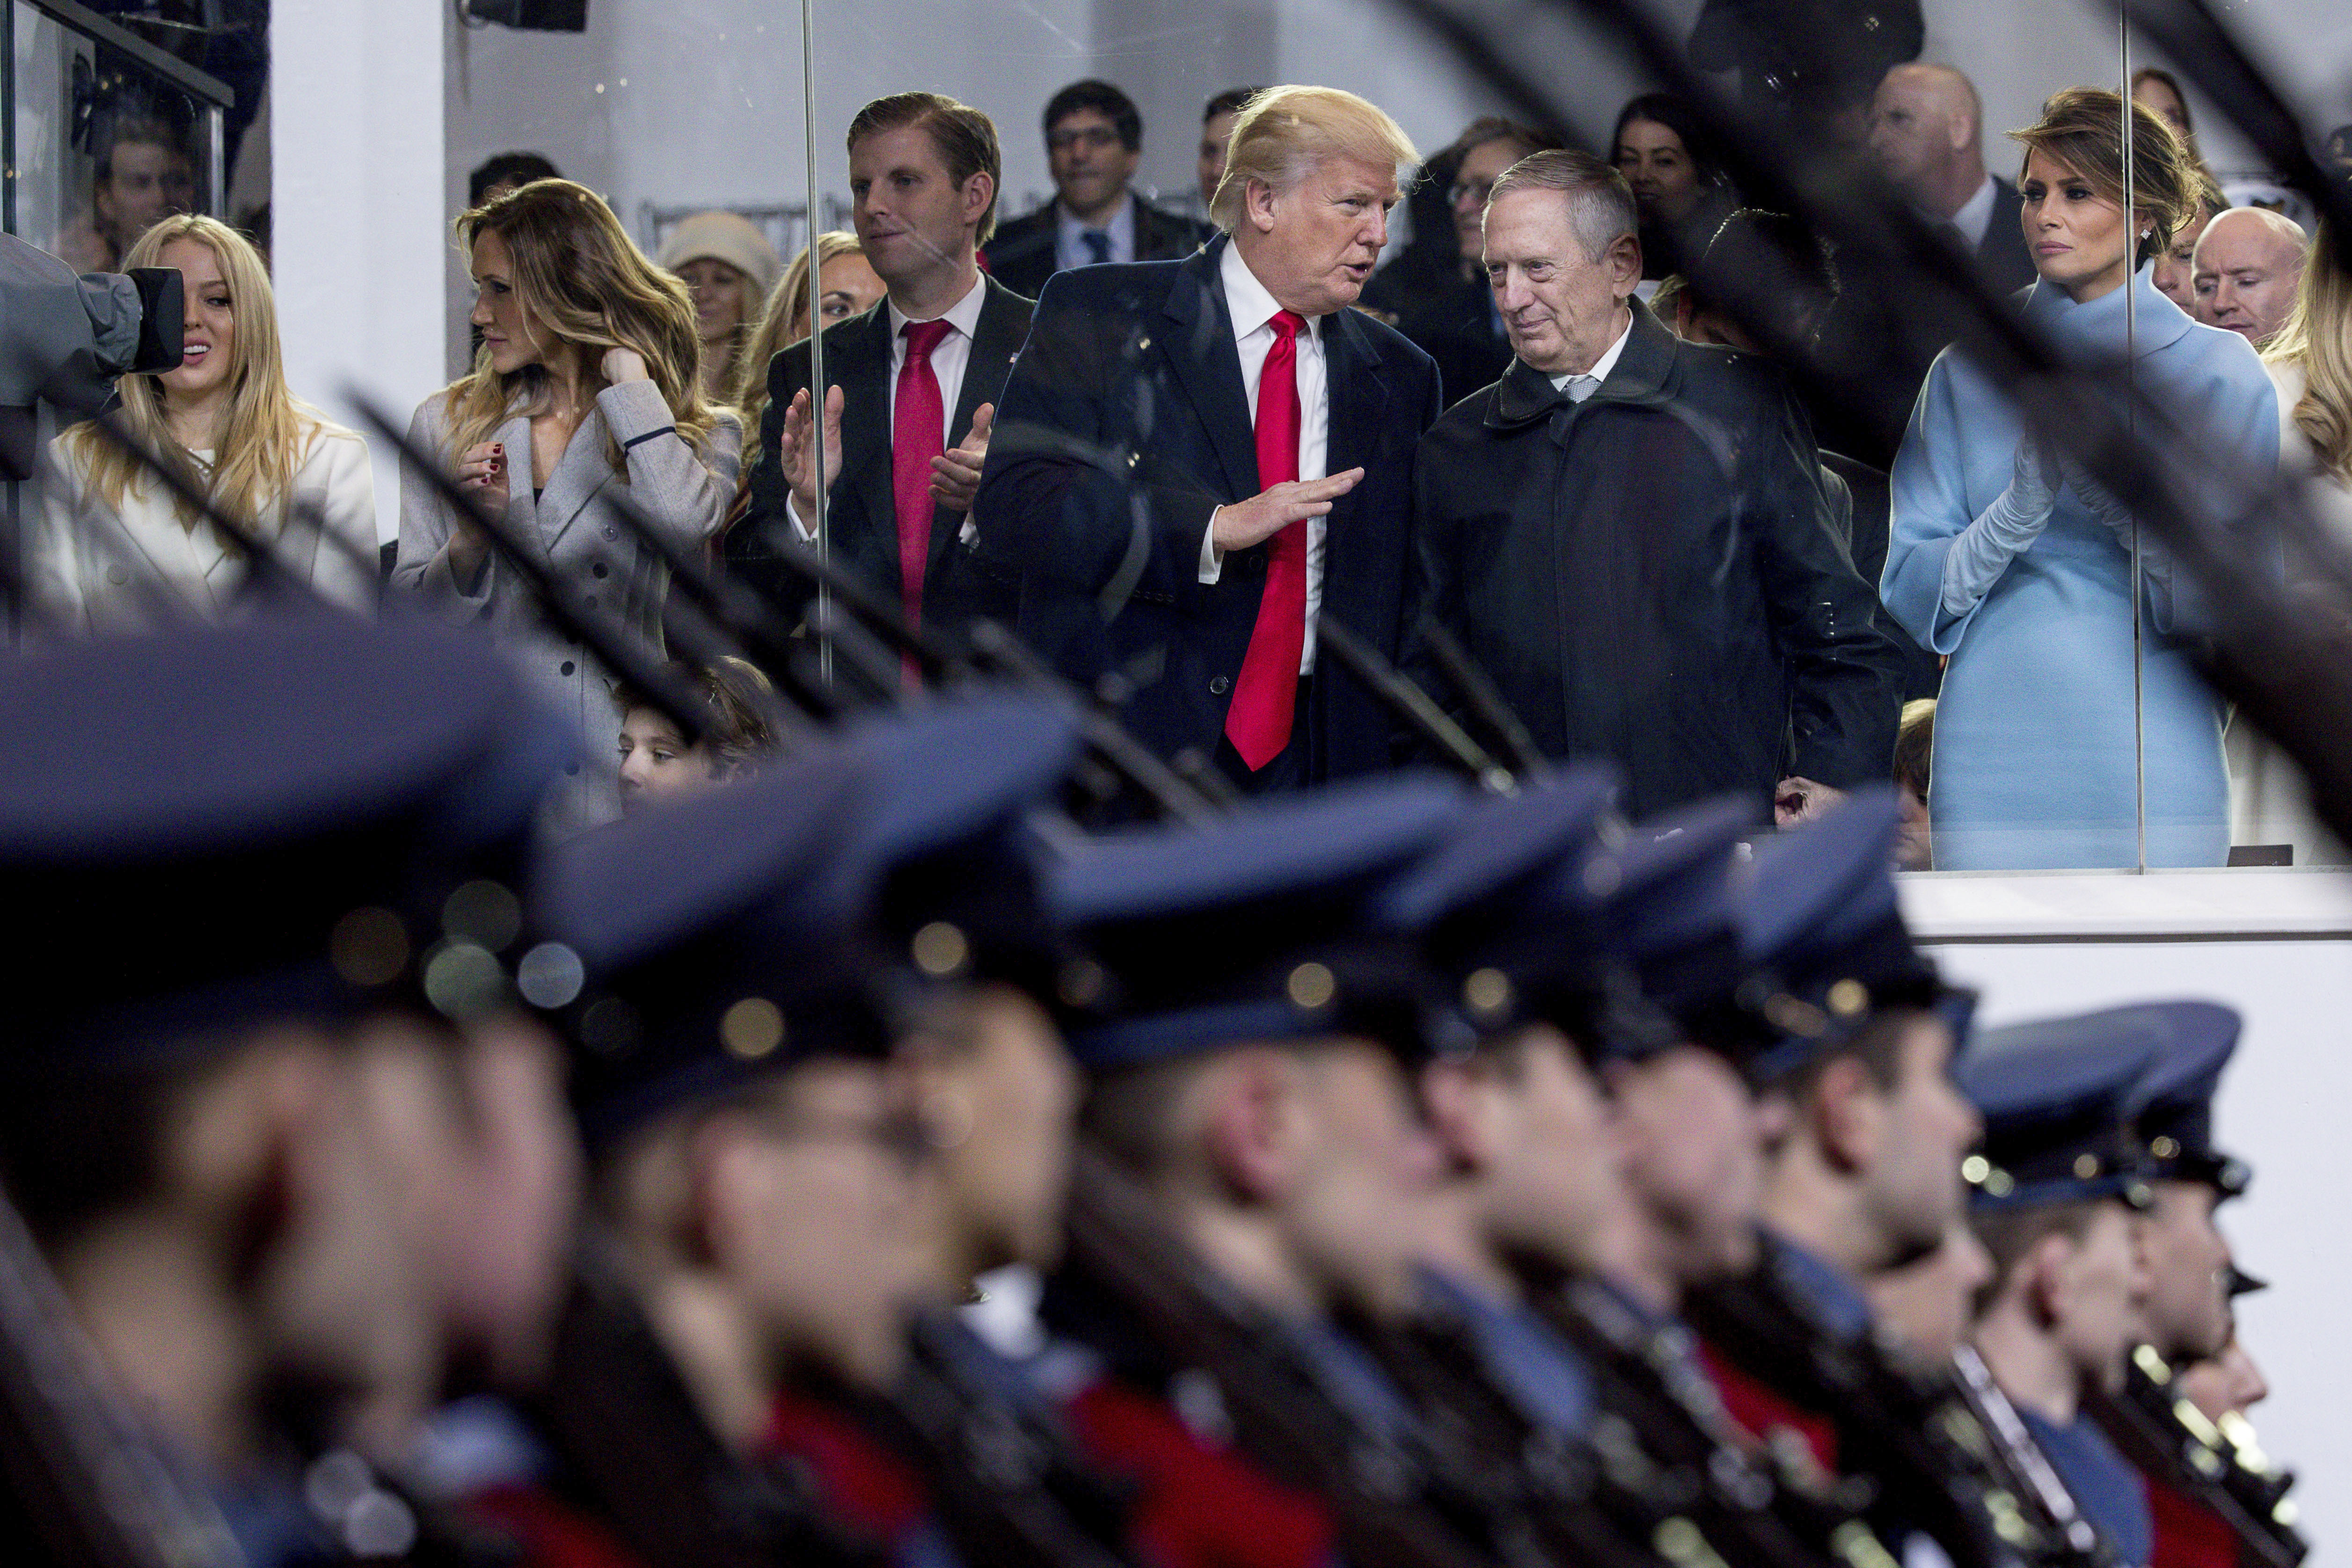 BBG networks cover 58th presidential inauguration